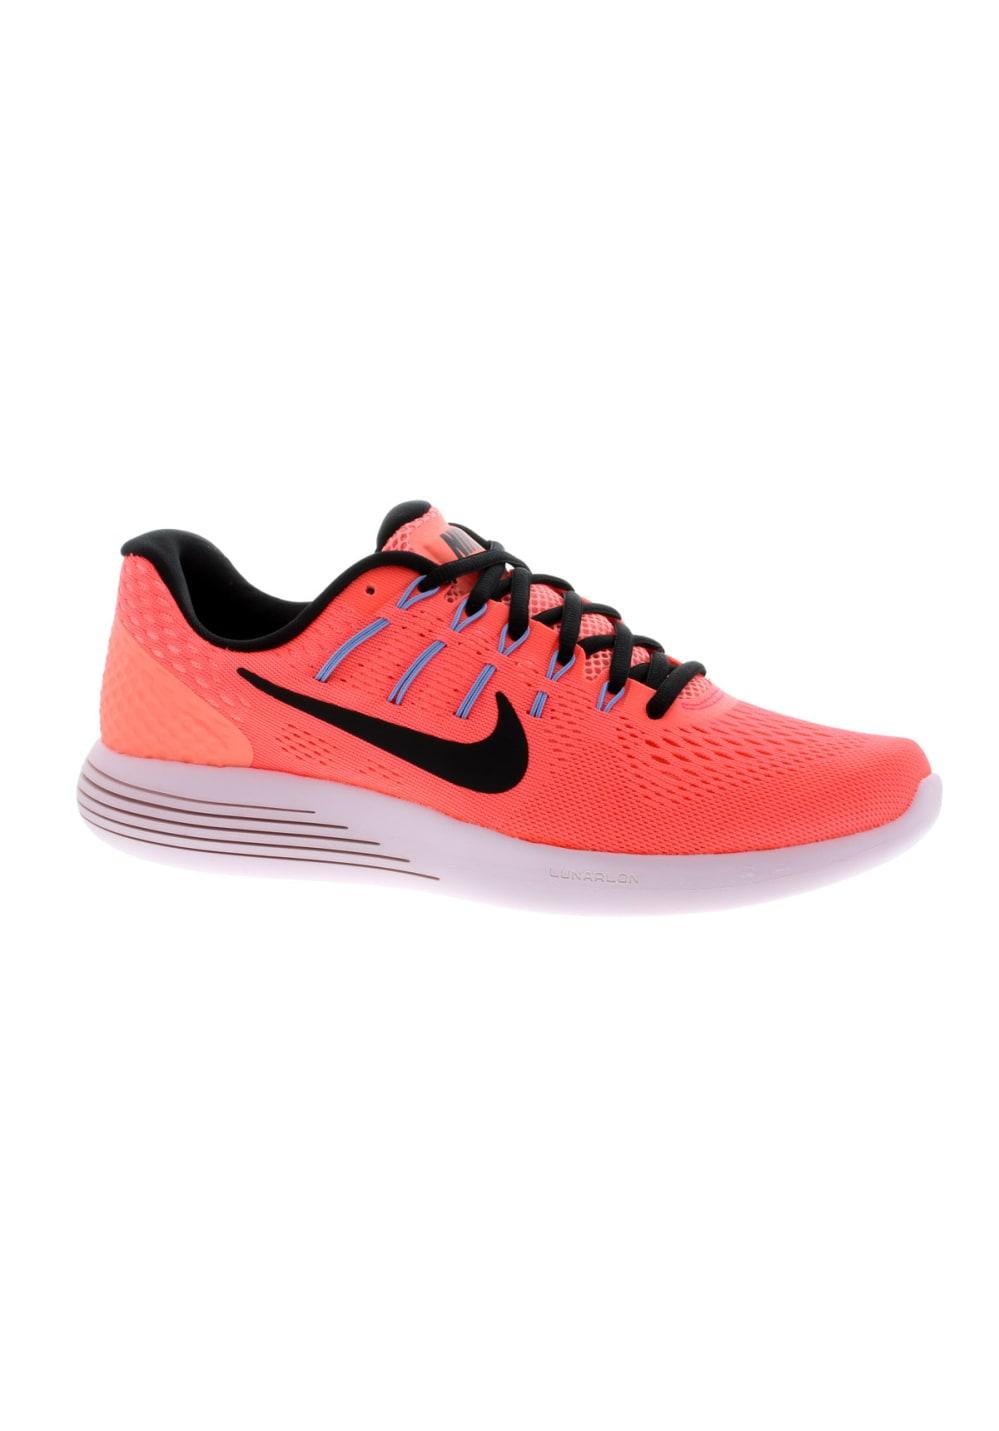 Lunarglide Running 8 Women For Pink21run Shoes Nike qj3ARLc54